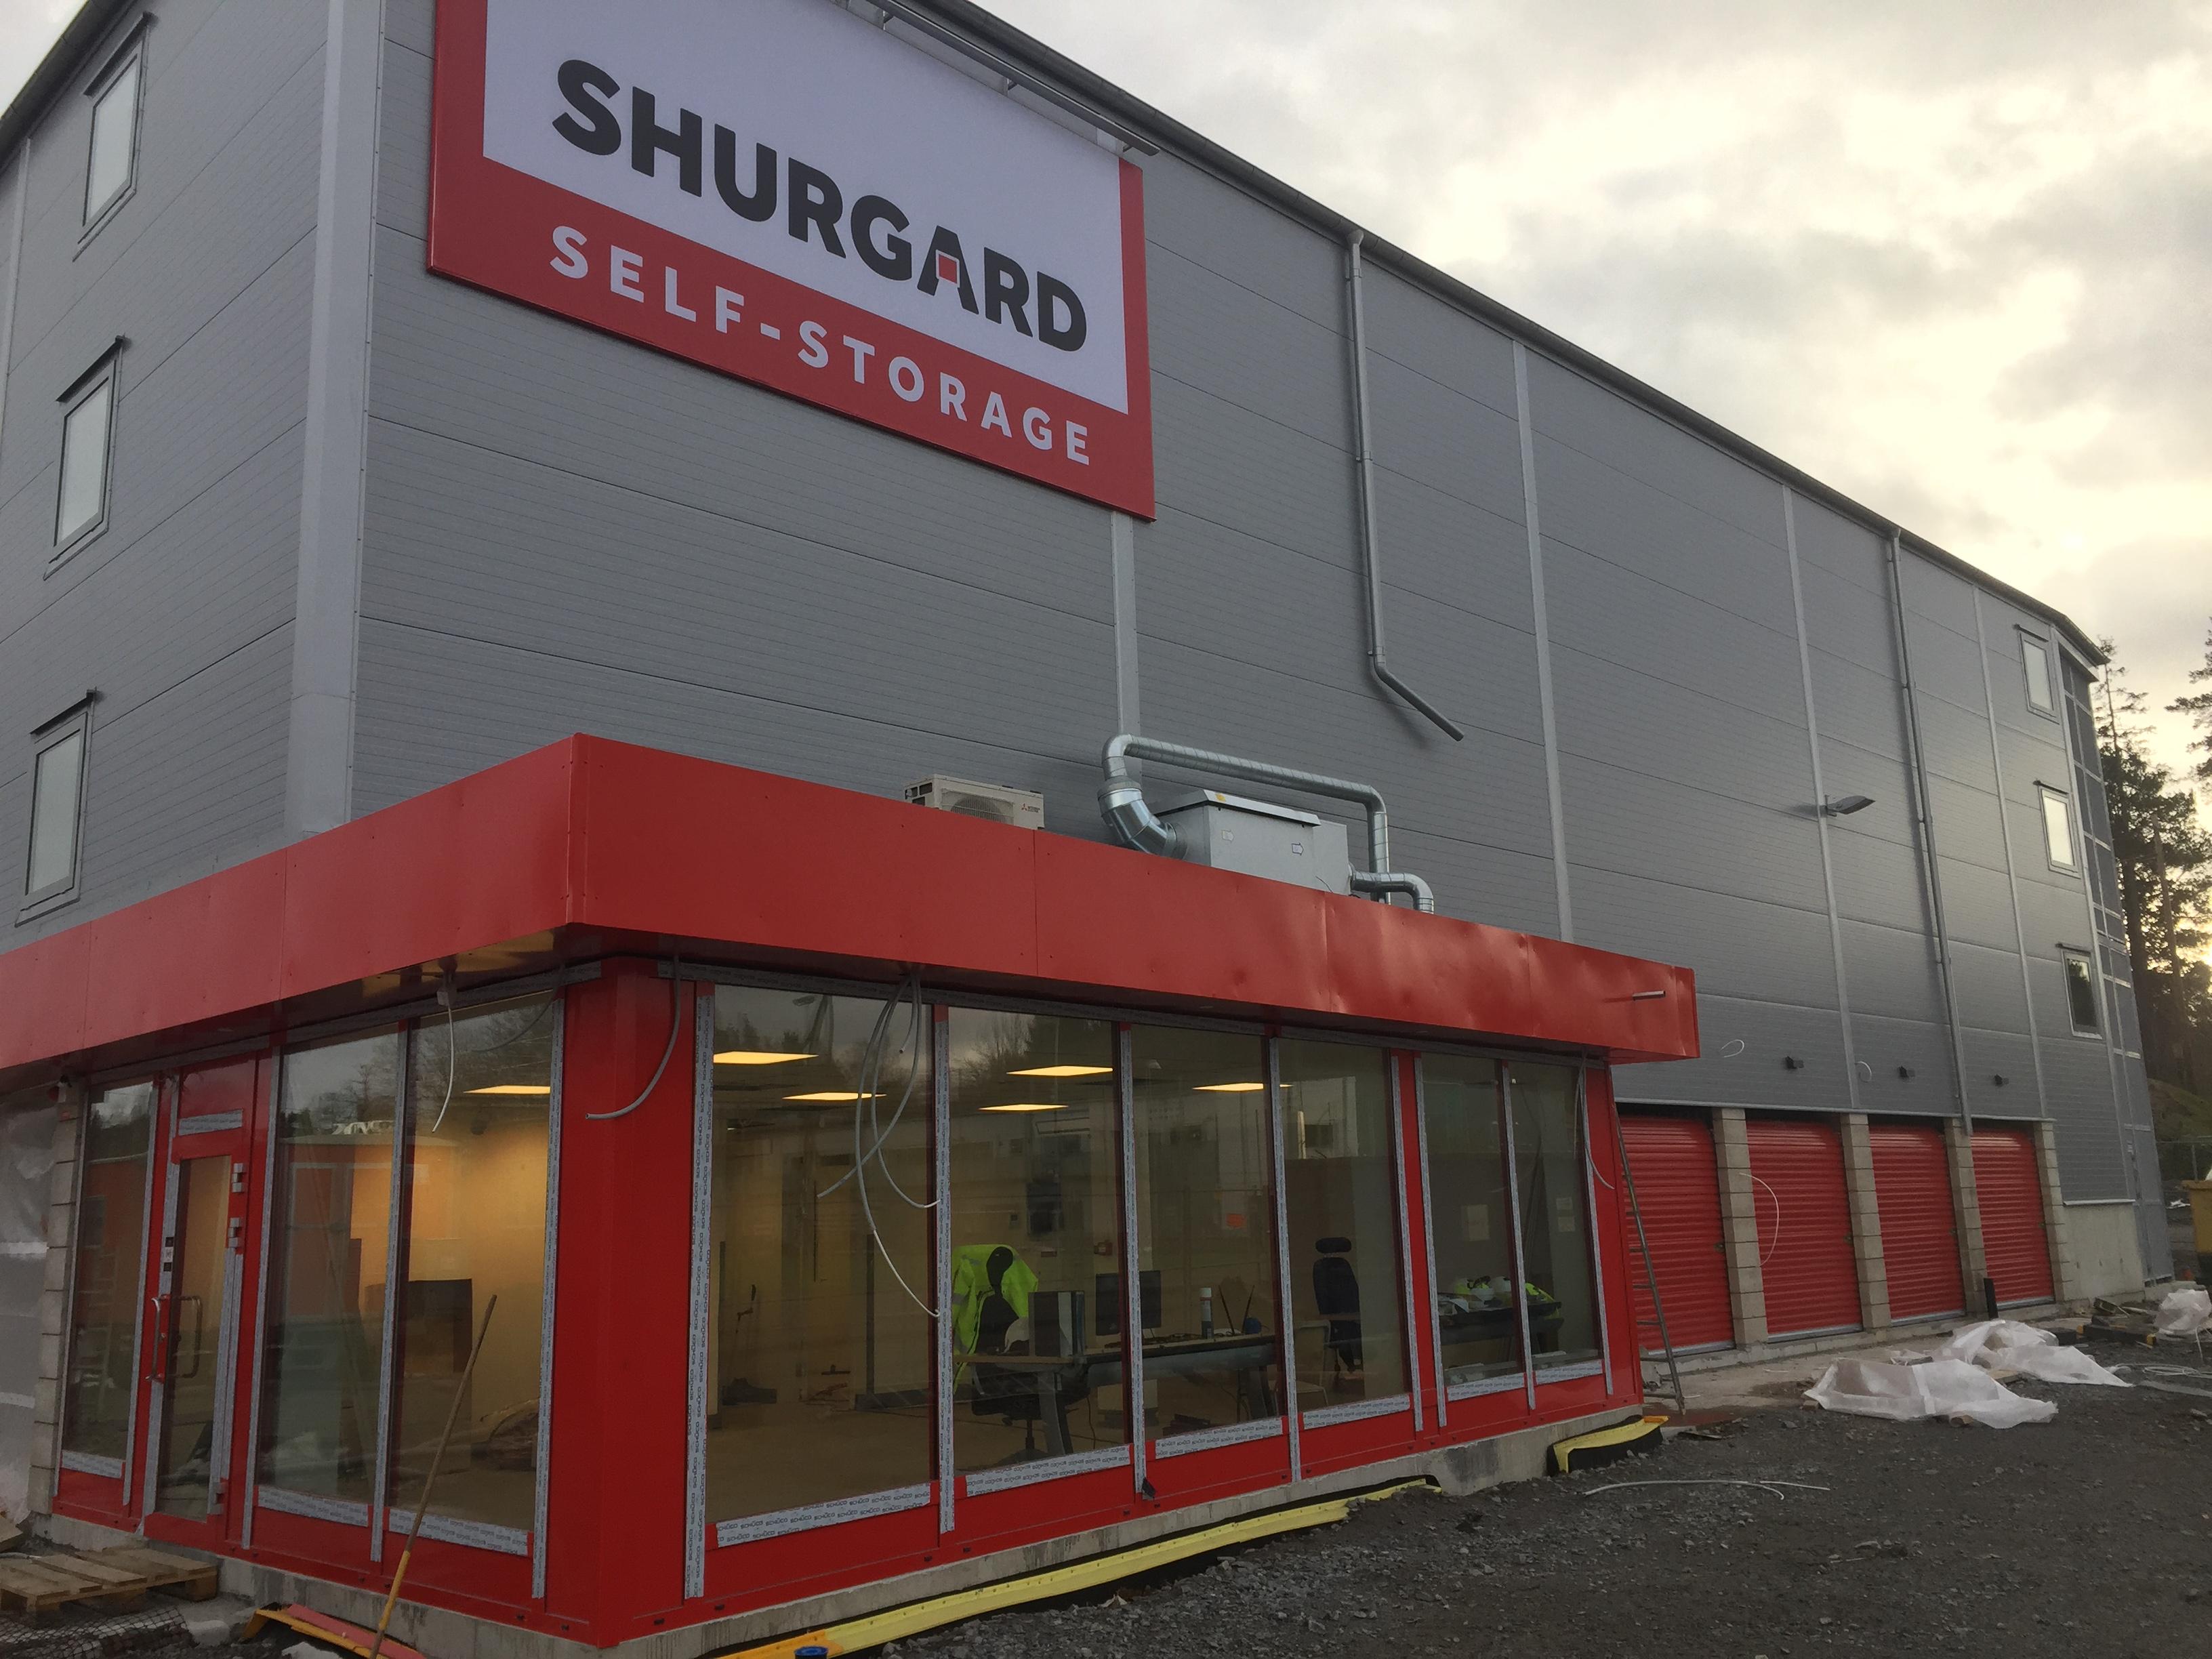 Shurgard Self-Storage Huddinge